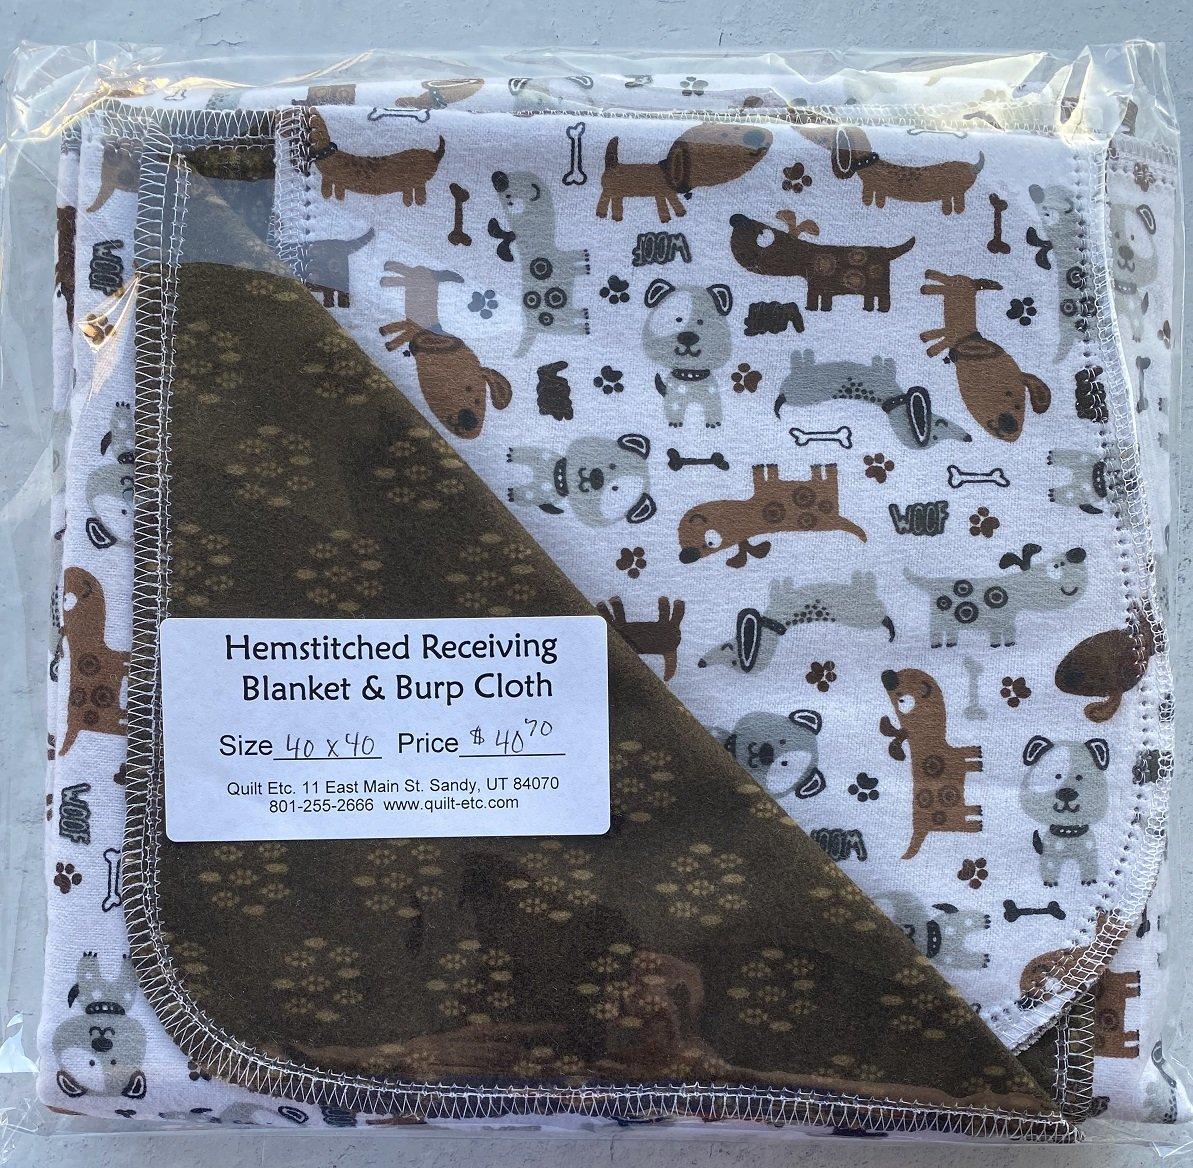 Hemstitched Receiving Blanket & Burp Cloth 11